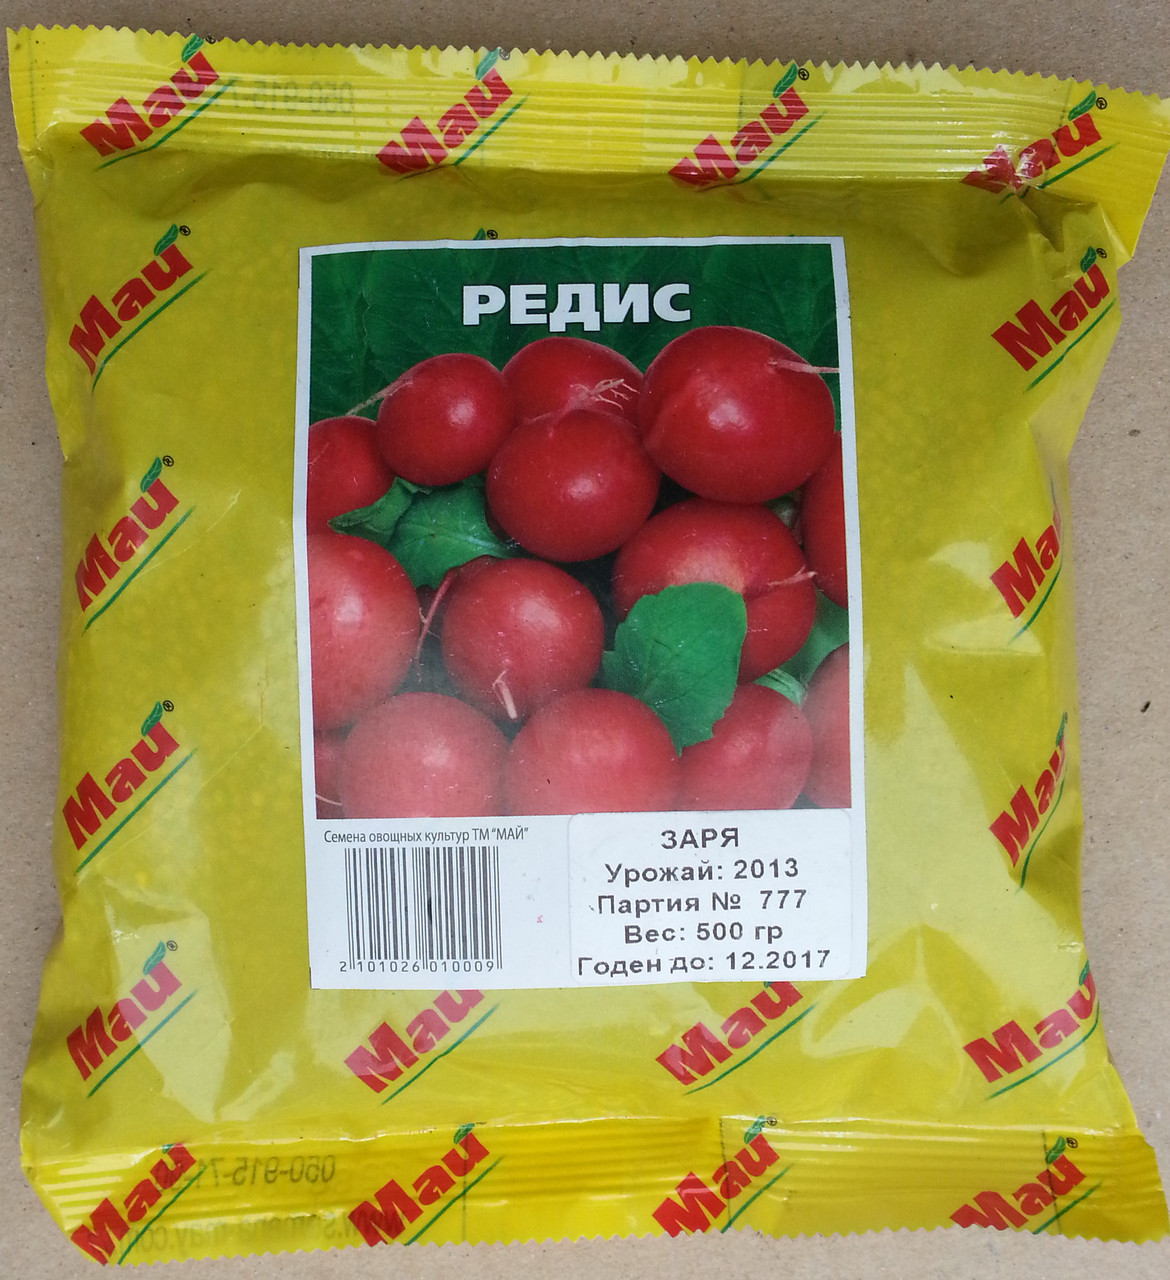 Семена редиса 0,5 сорт Заря